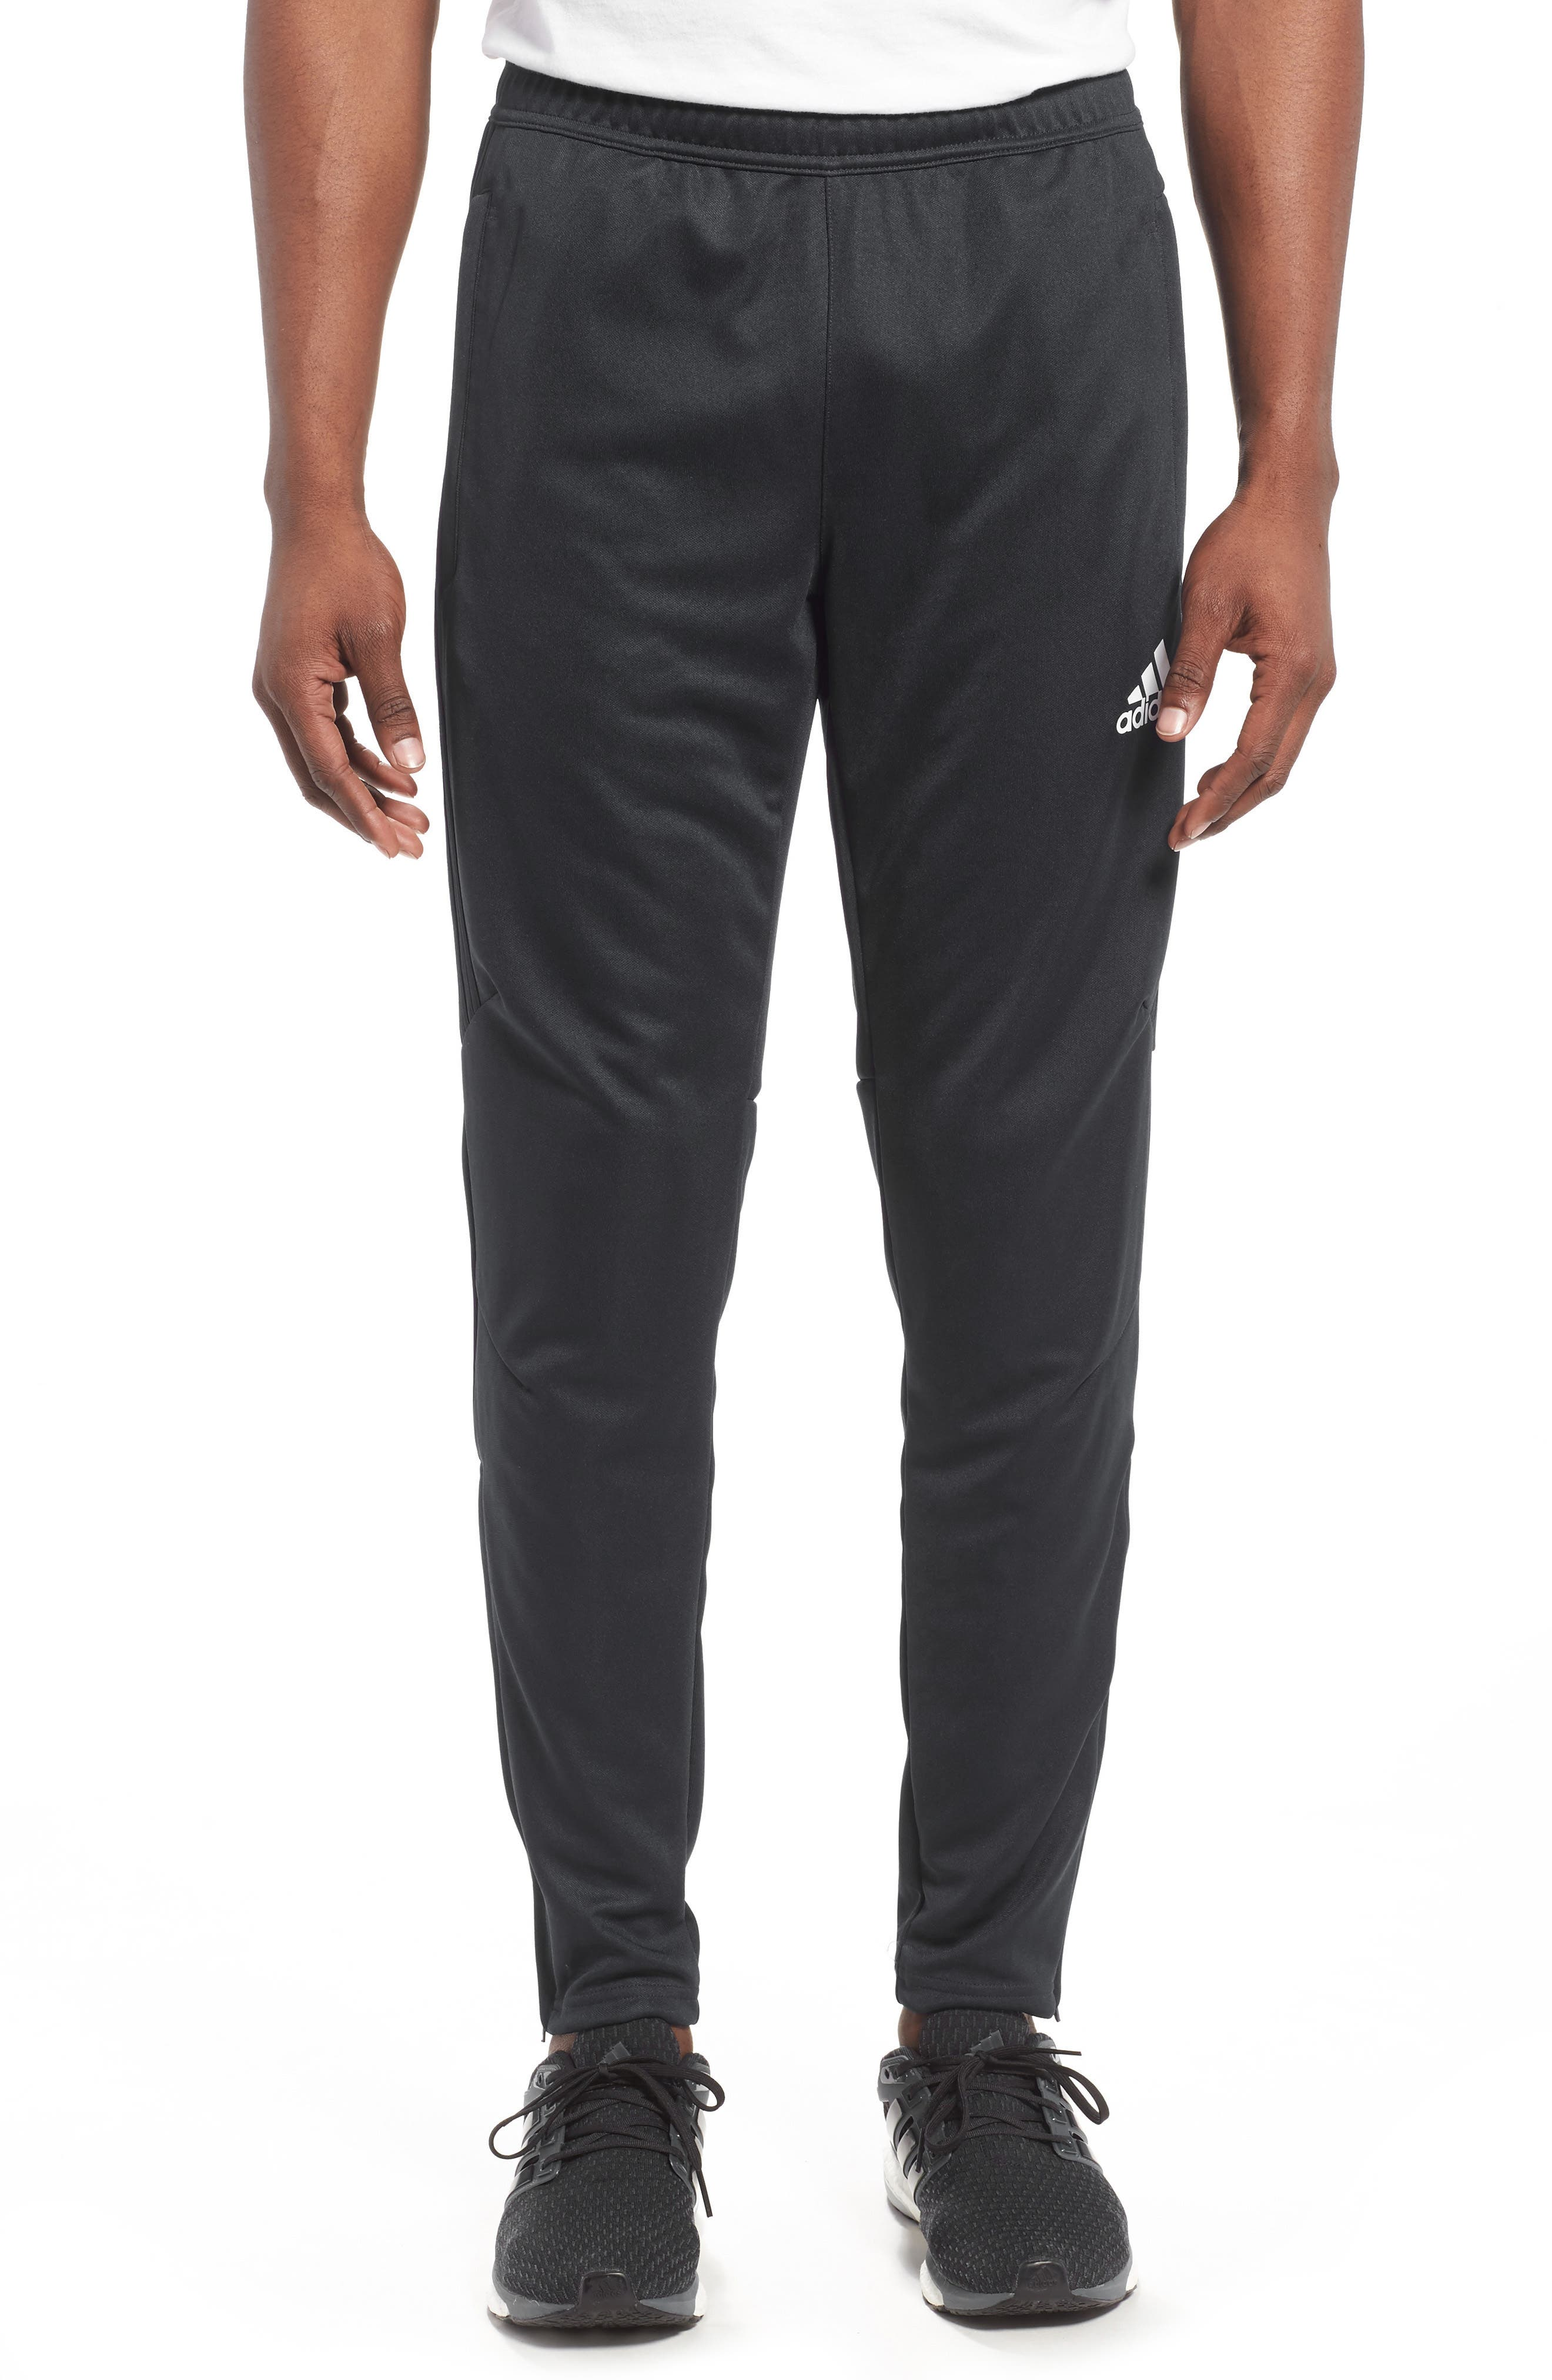 ADIDAS Tiro 17 Training Pants, Main, color, BLACK/ WHITE/ WHITE